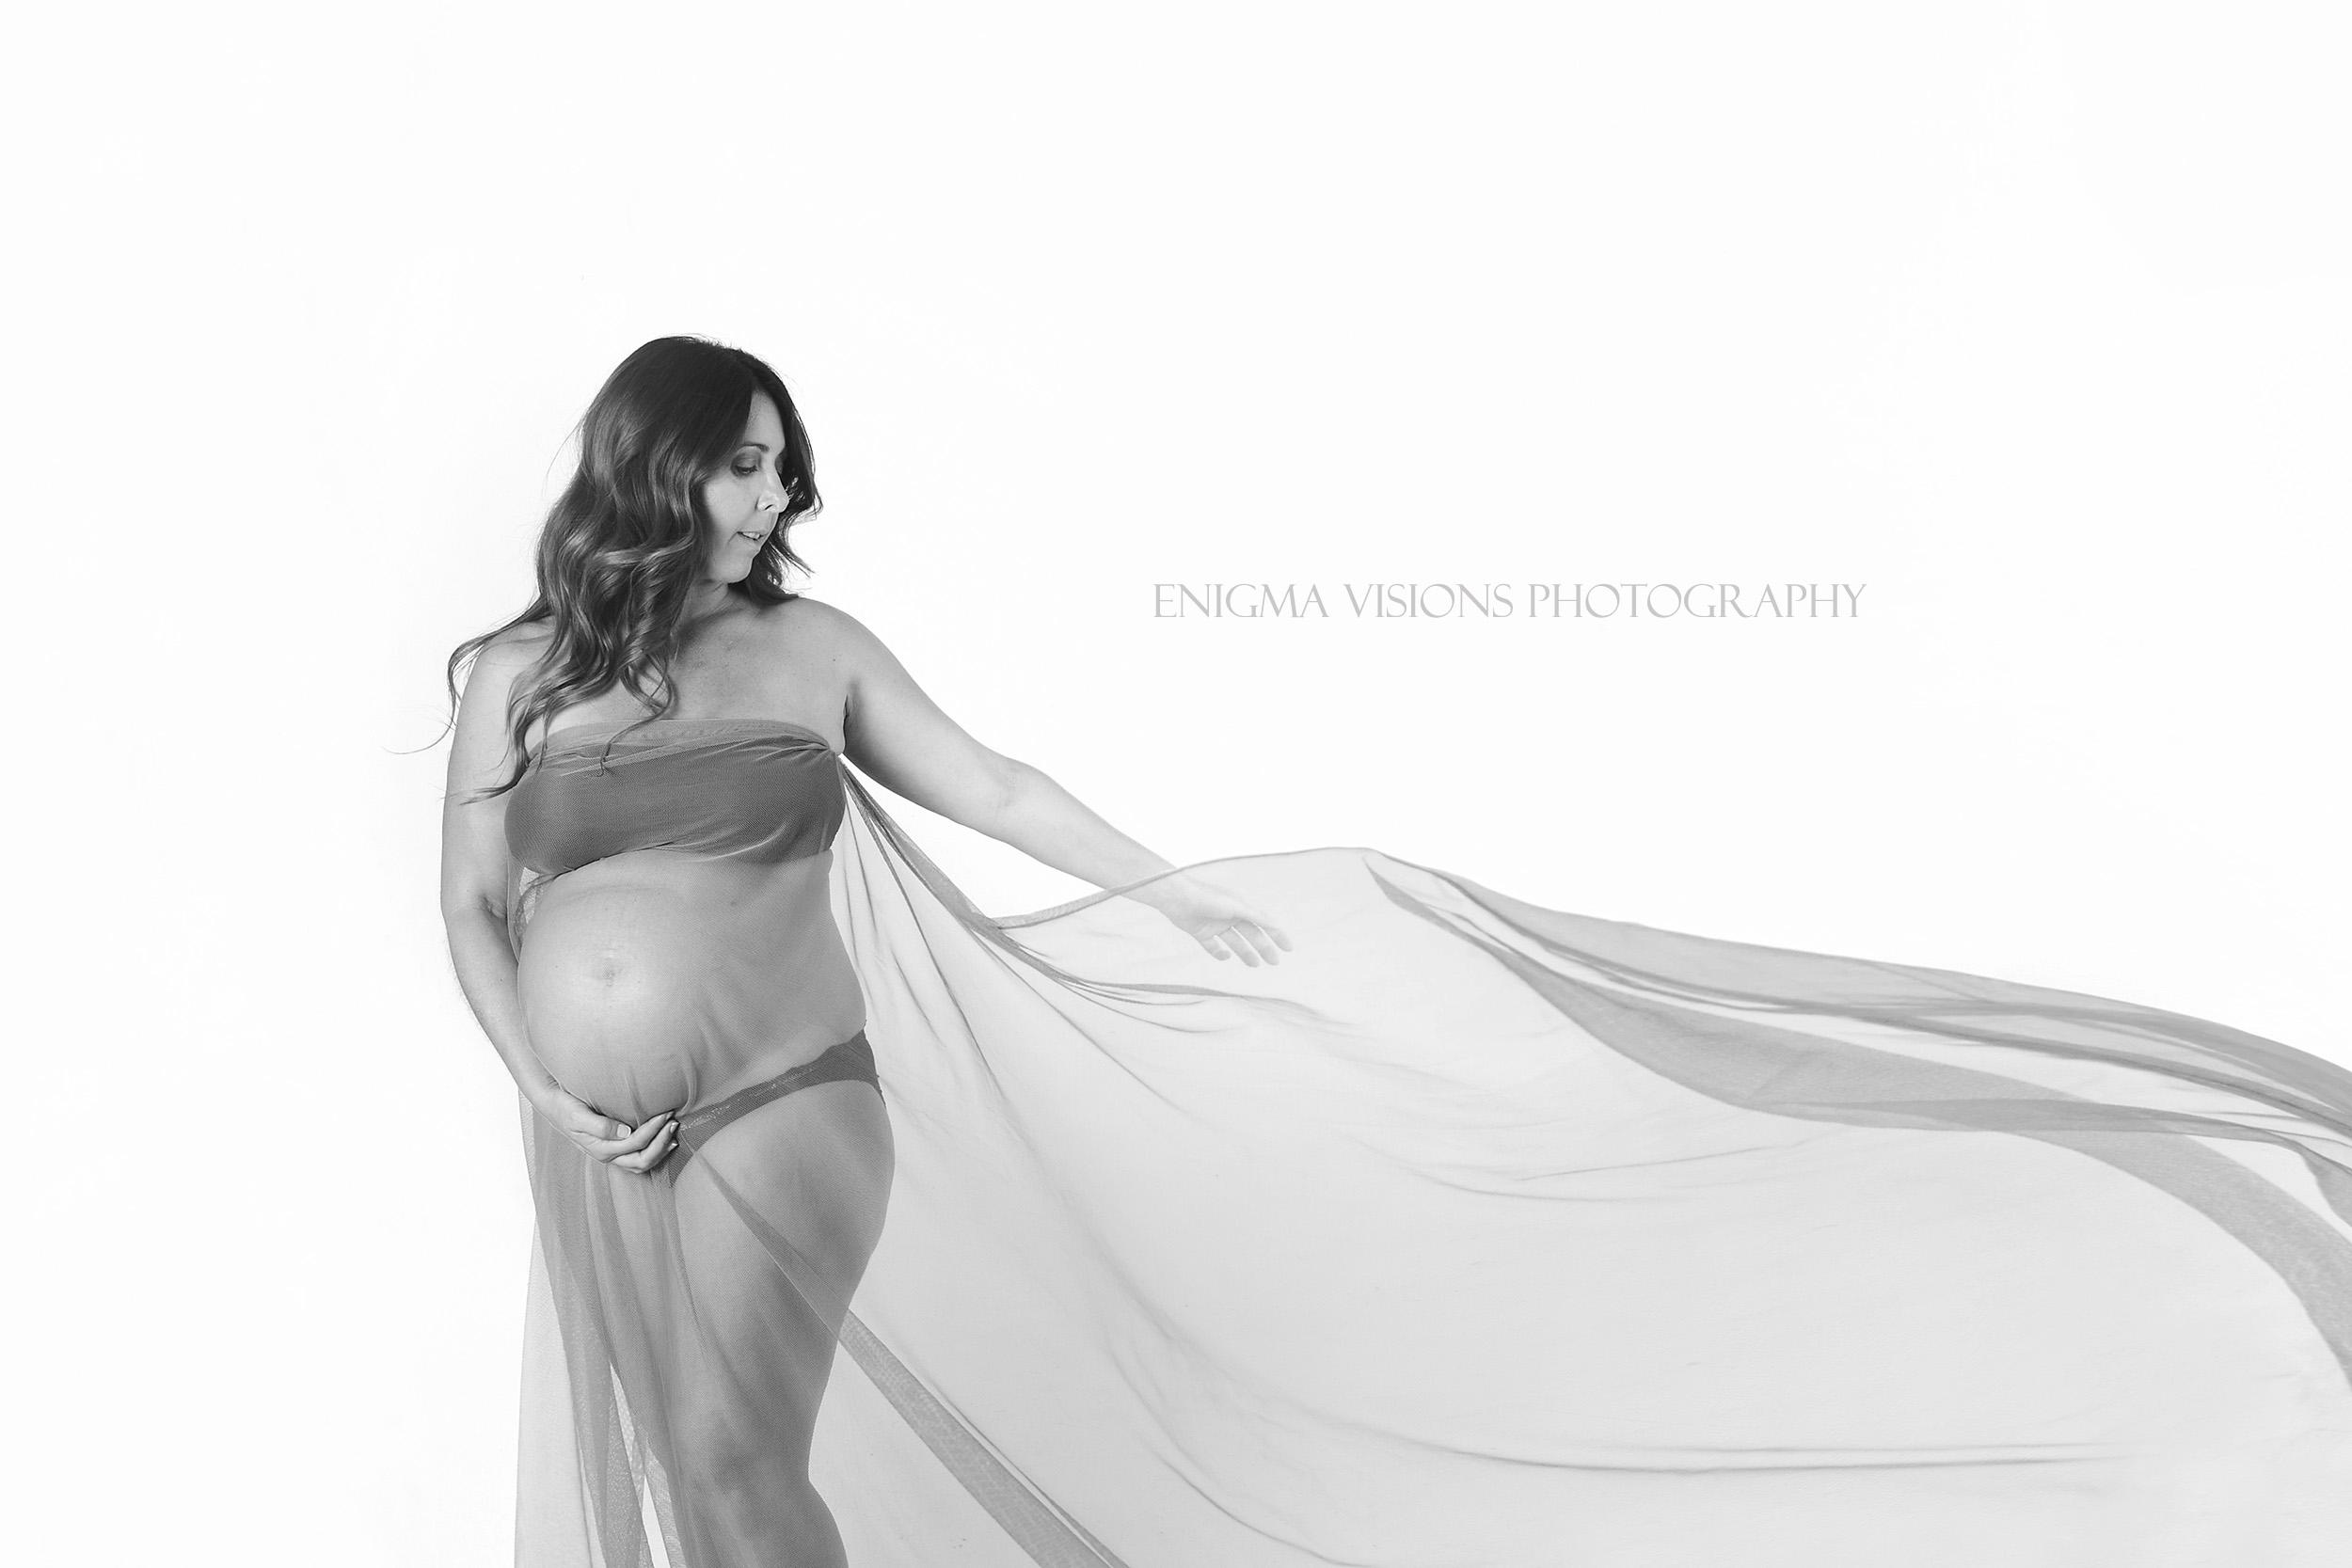 enigma_visions_photography_maternity_rachel_fingal (4).jpg